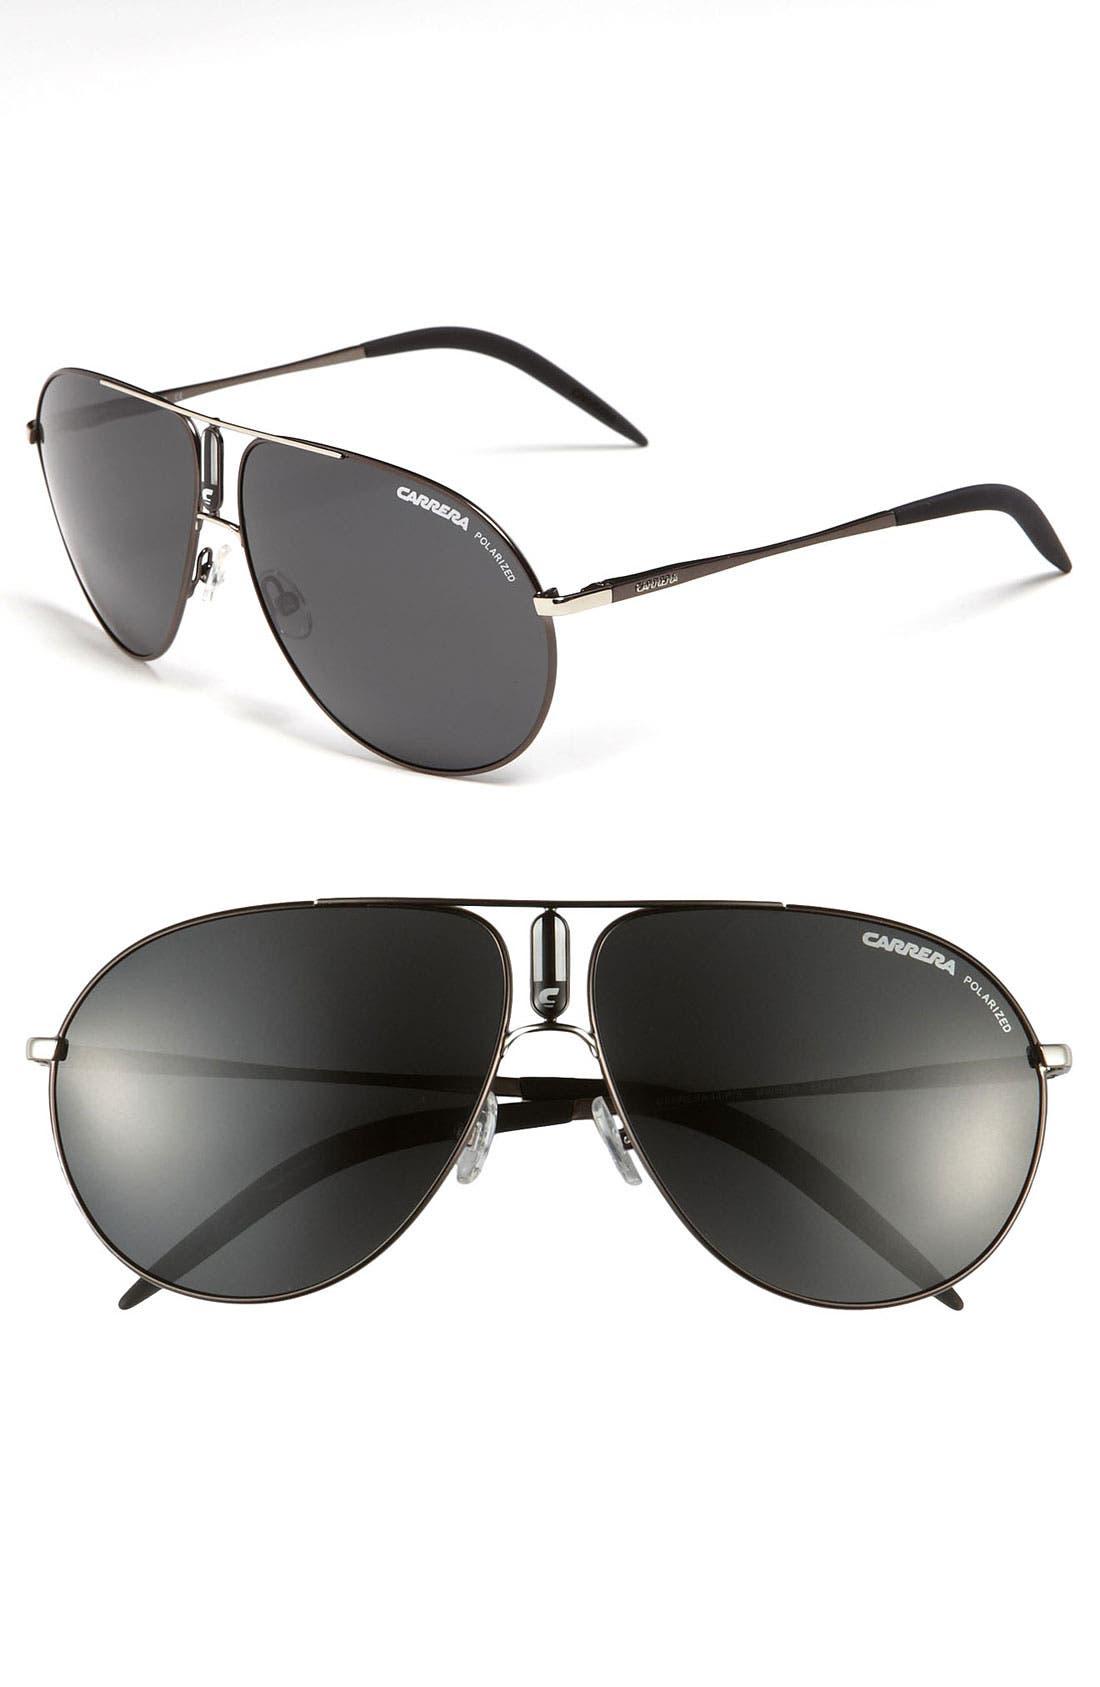 Alternate Image 1 Selected - Carrera Eyewear 61mm Polarized Aviator Sunglasses